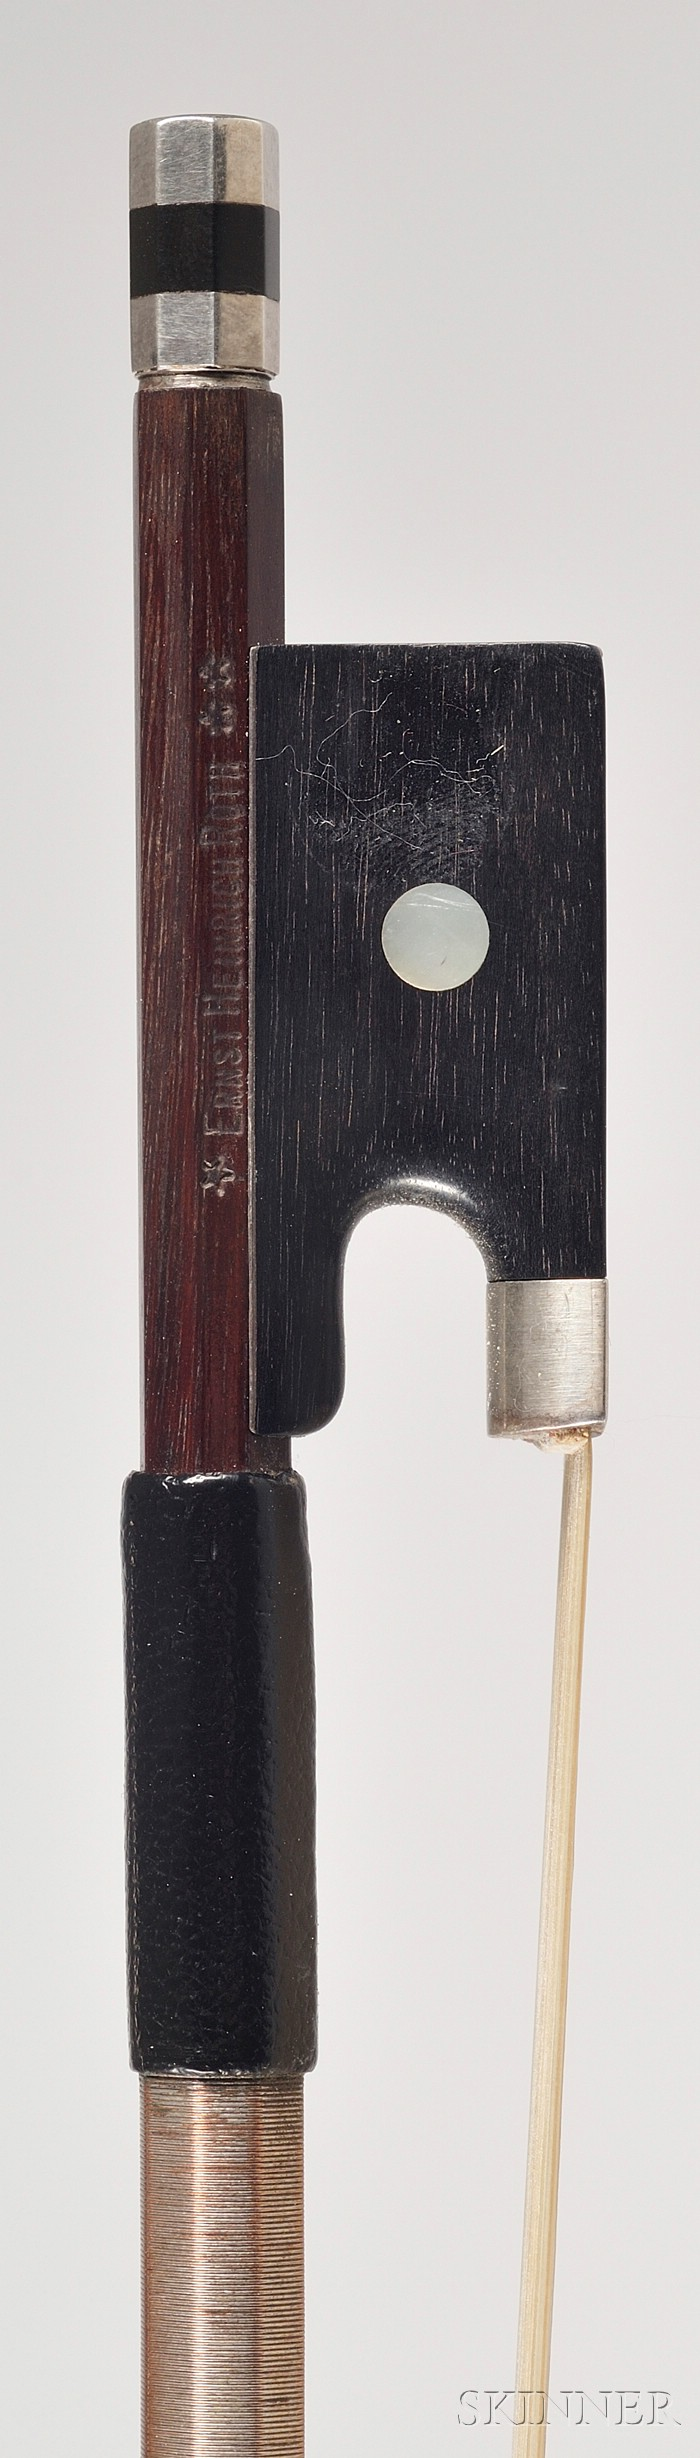 Silver Mounted Viola Bow, Ernst Heinrich Roth Workshop